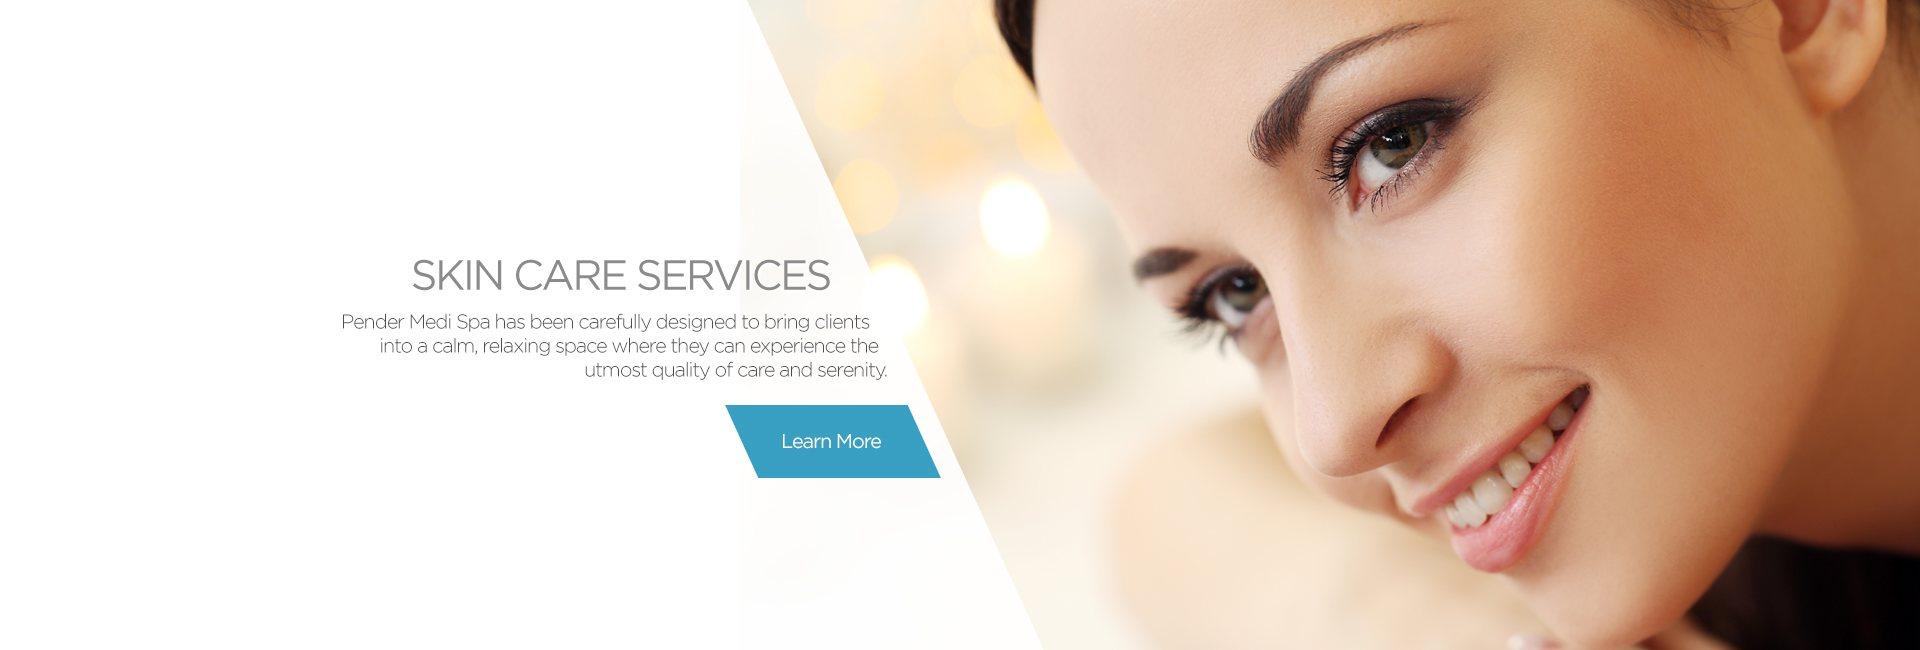 spa-services-22